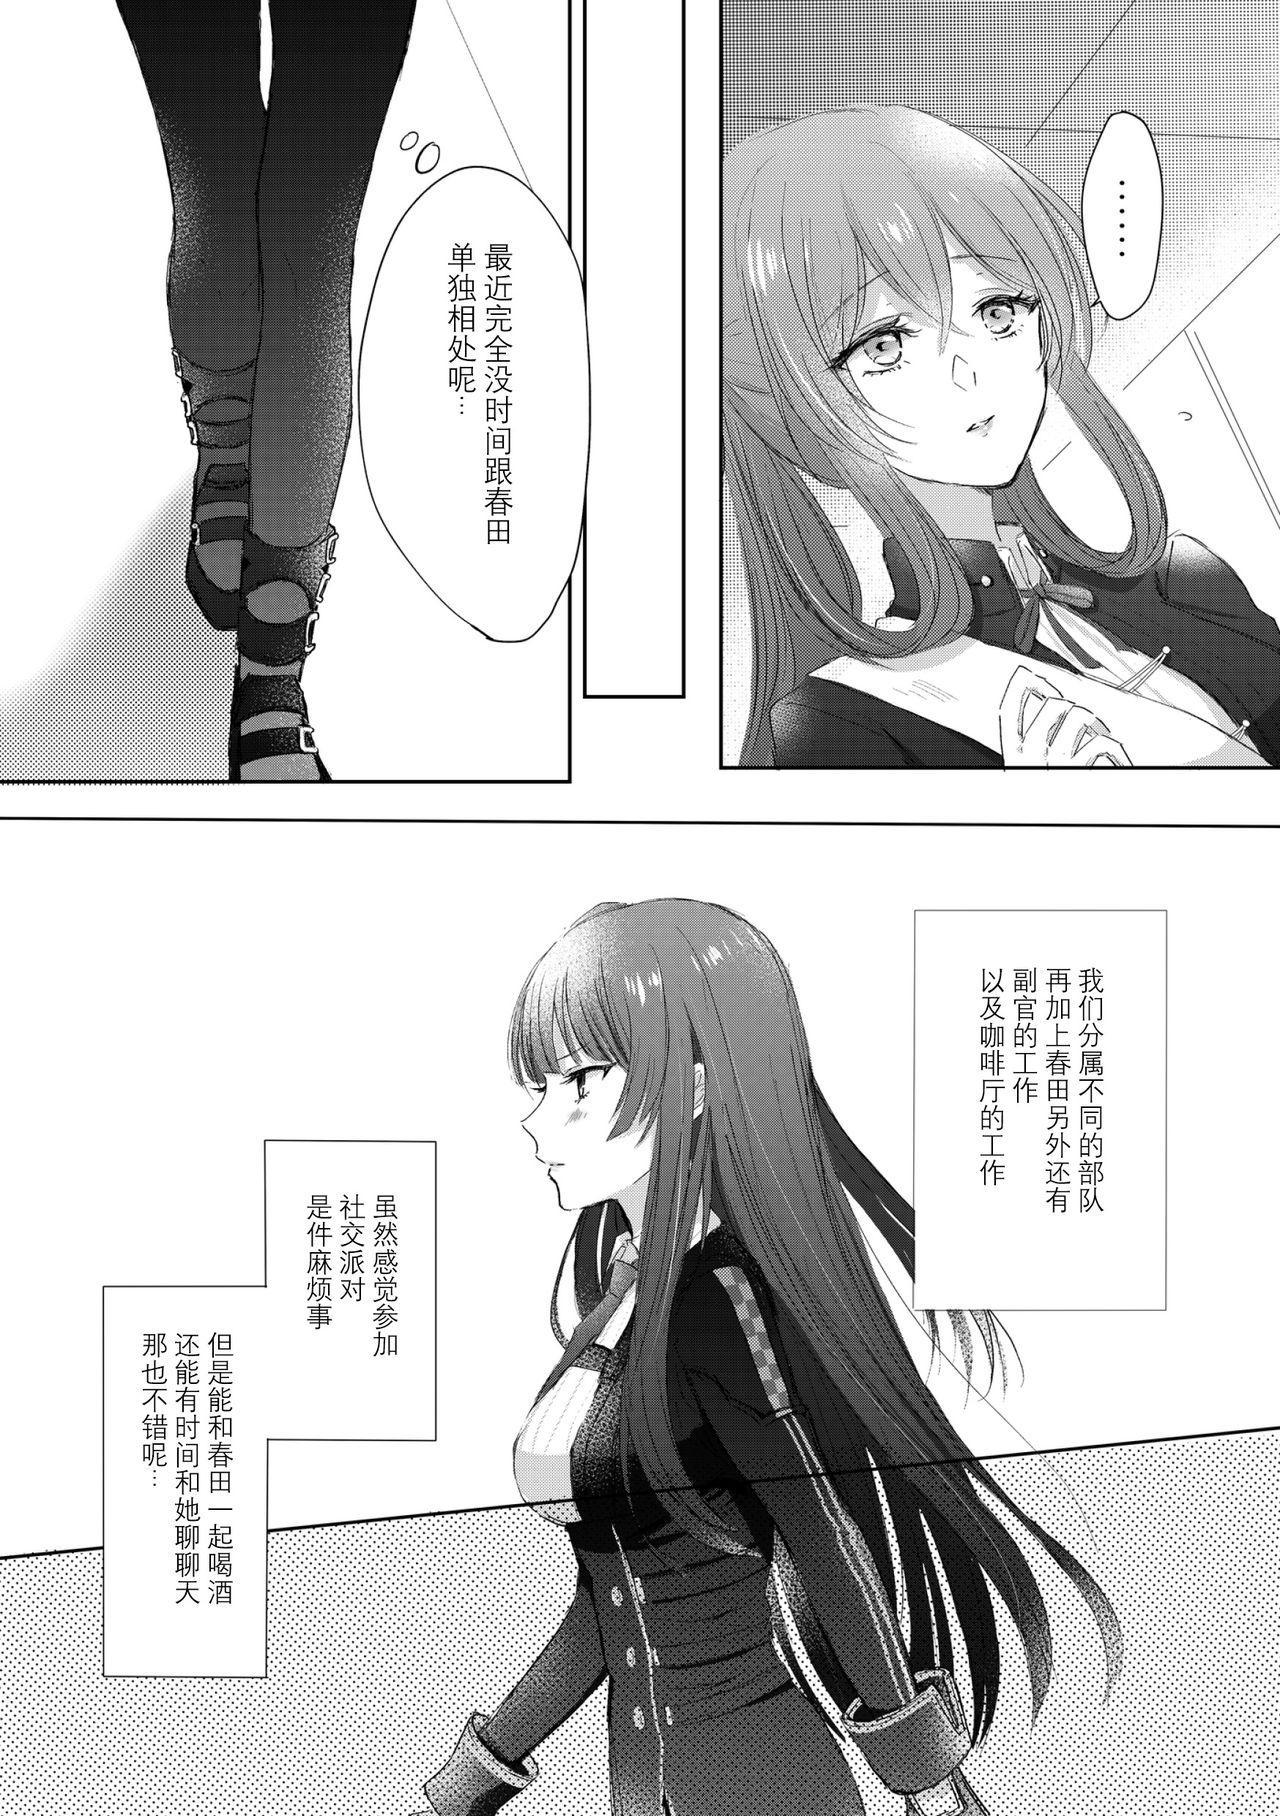 [(Yuri=18L)sui] Alcohol wa Amai (Girls' Frontline) [Chinese]   酒精是甘甜滋味 (少女前線) [提黄灯喵汉化组] 3